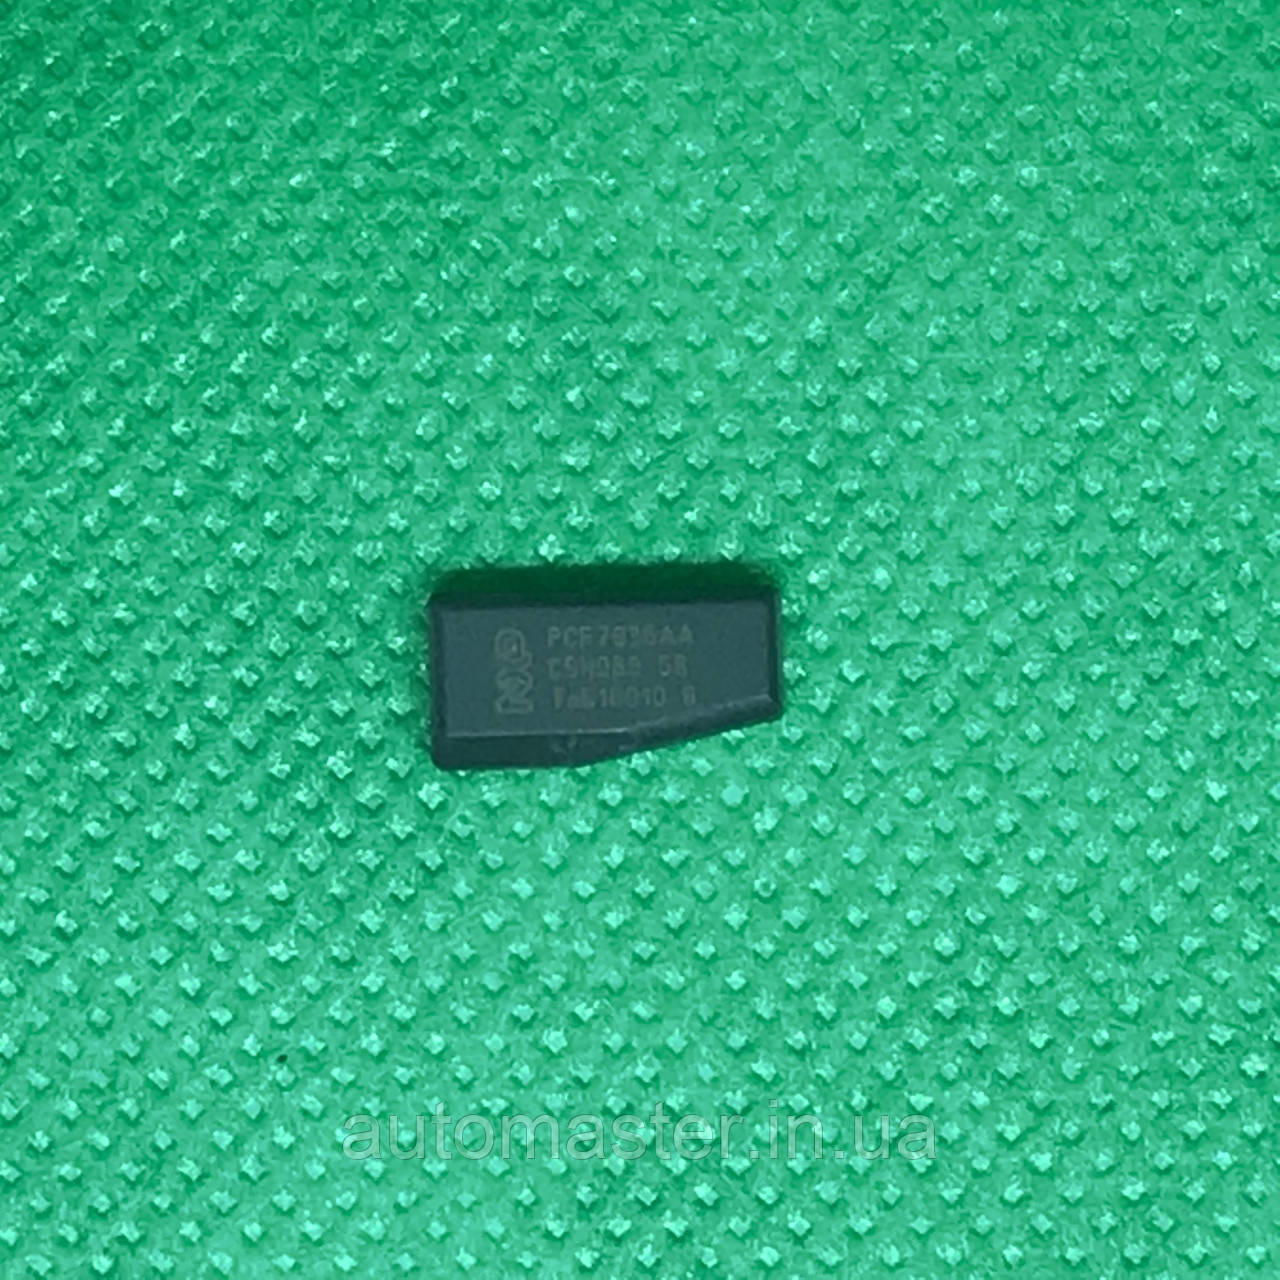 Чип транспондер ID 46 Nissan керамика